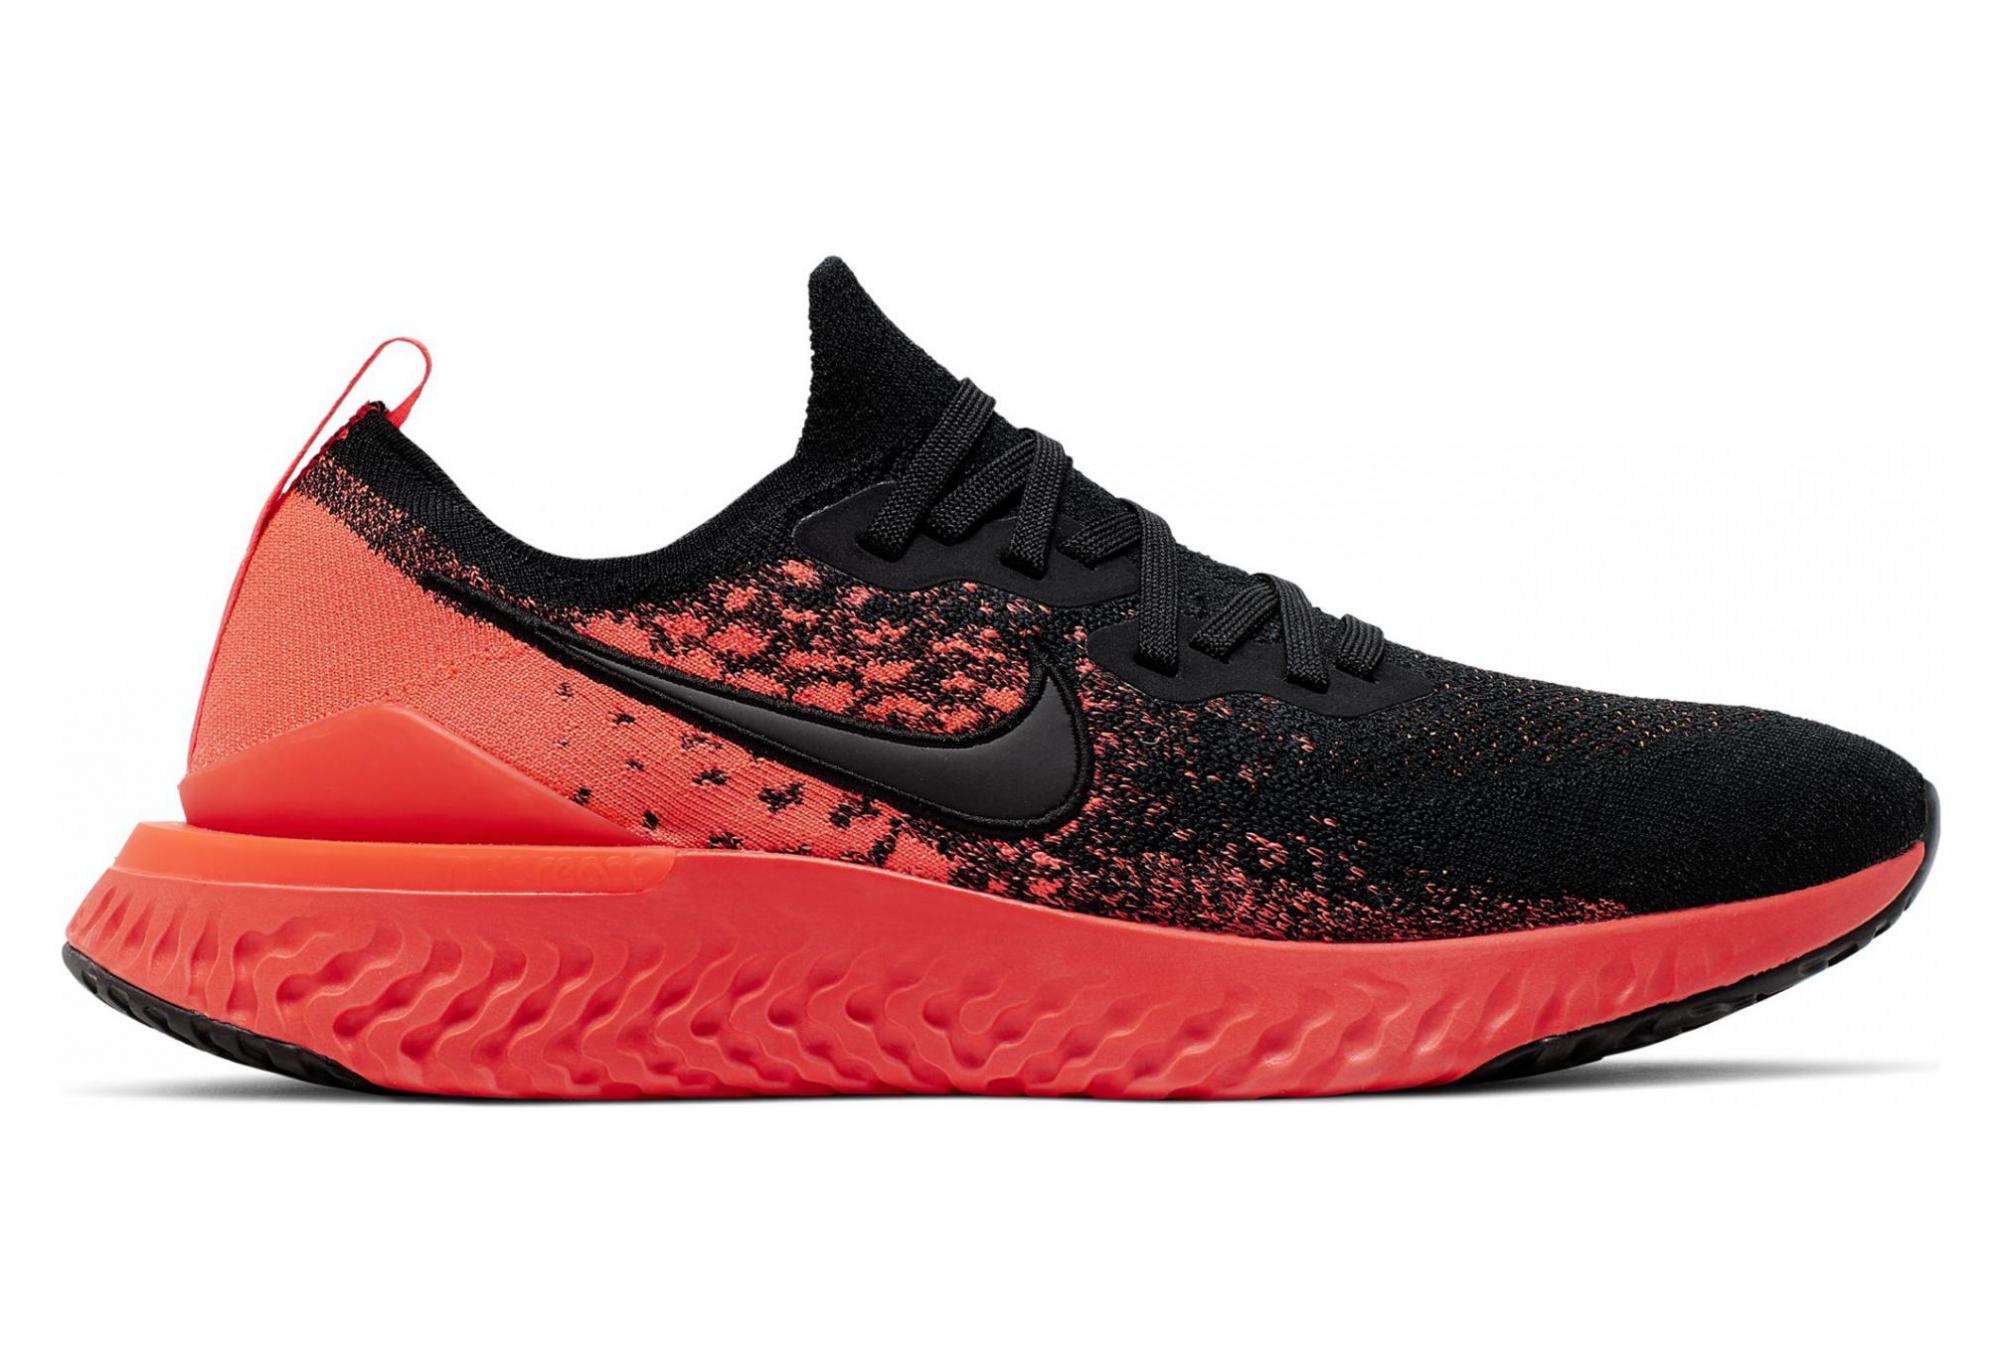 Nike Free Run 4.0 Flyknit V2 Women's bright orange Men # 012